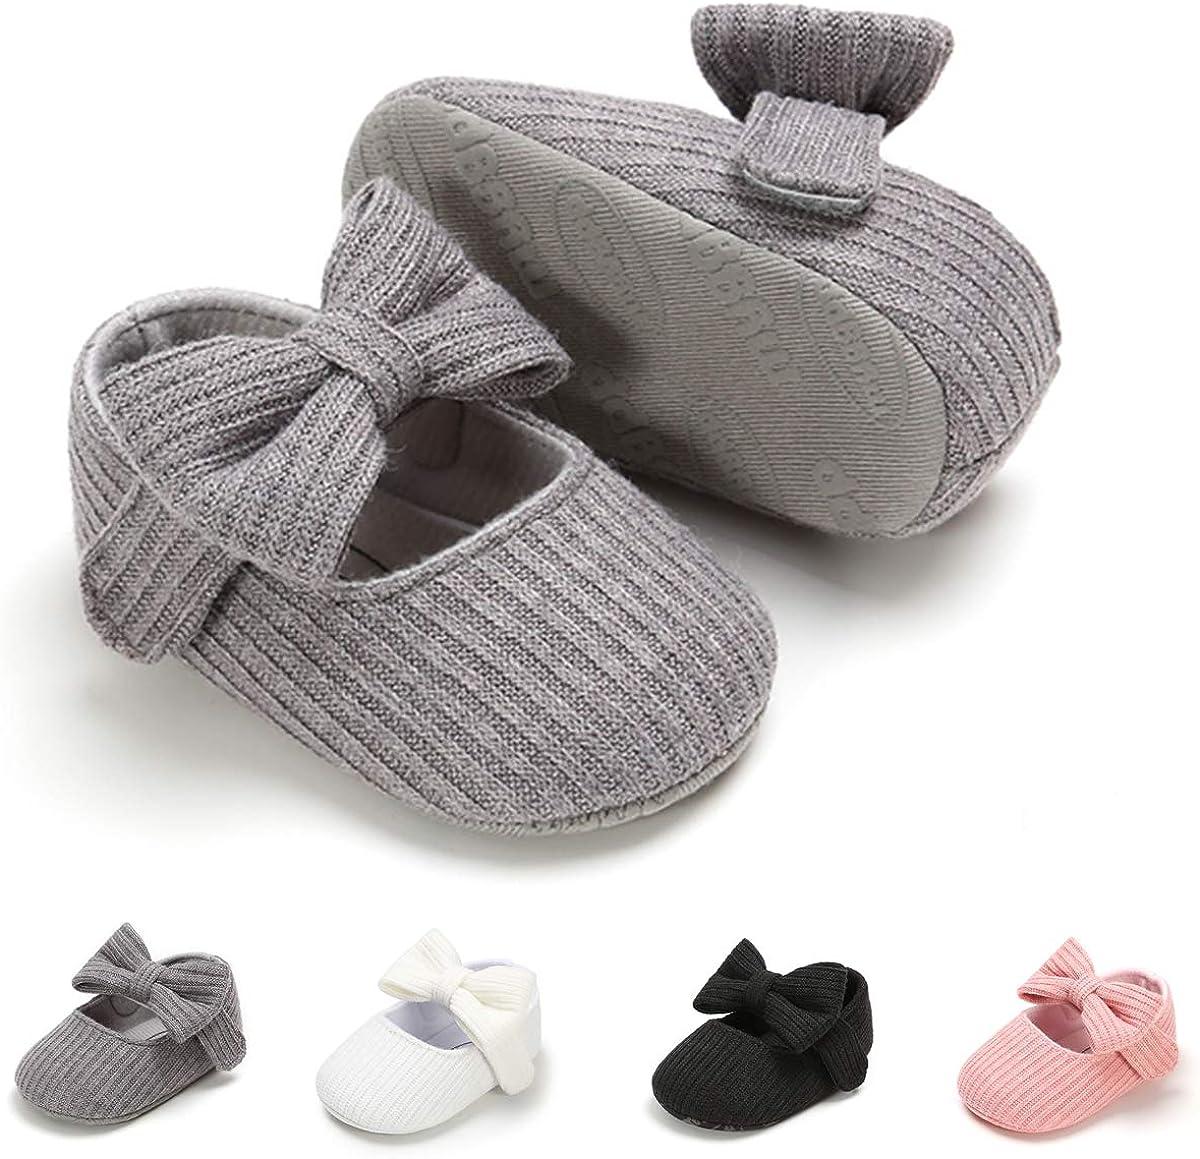   Ohwawadi Infant Baby Boys Girls Slippers Cozy Fleece Booties Soft Bottom Warm Cartoon Socks Newborn Crib Shoes   Mary Jane